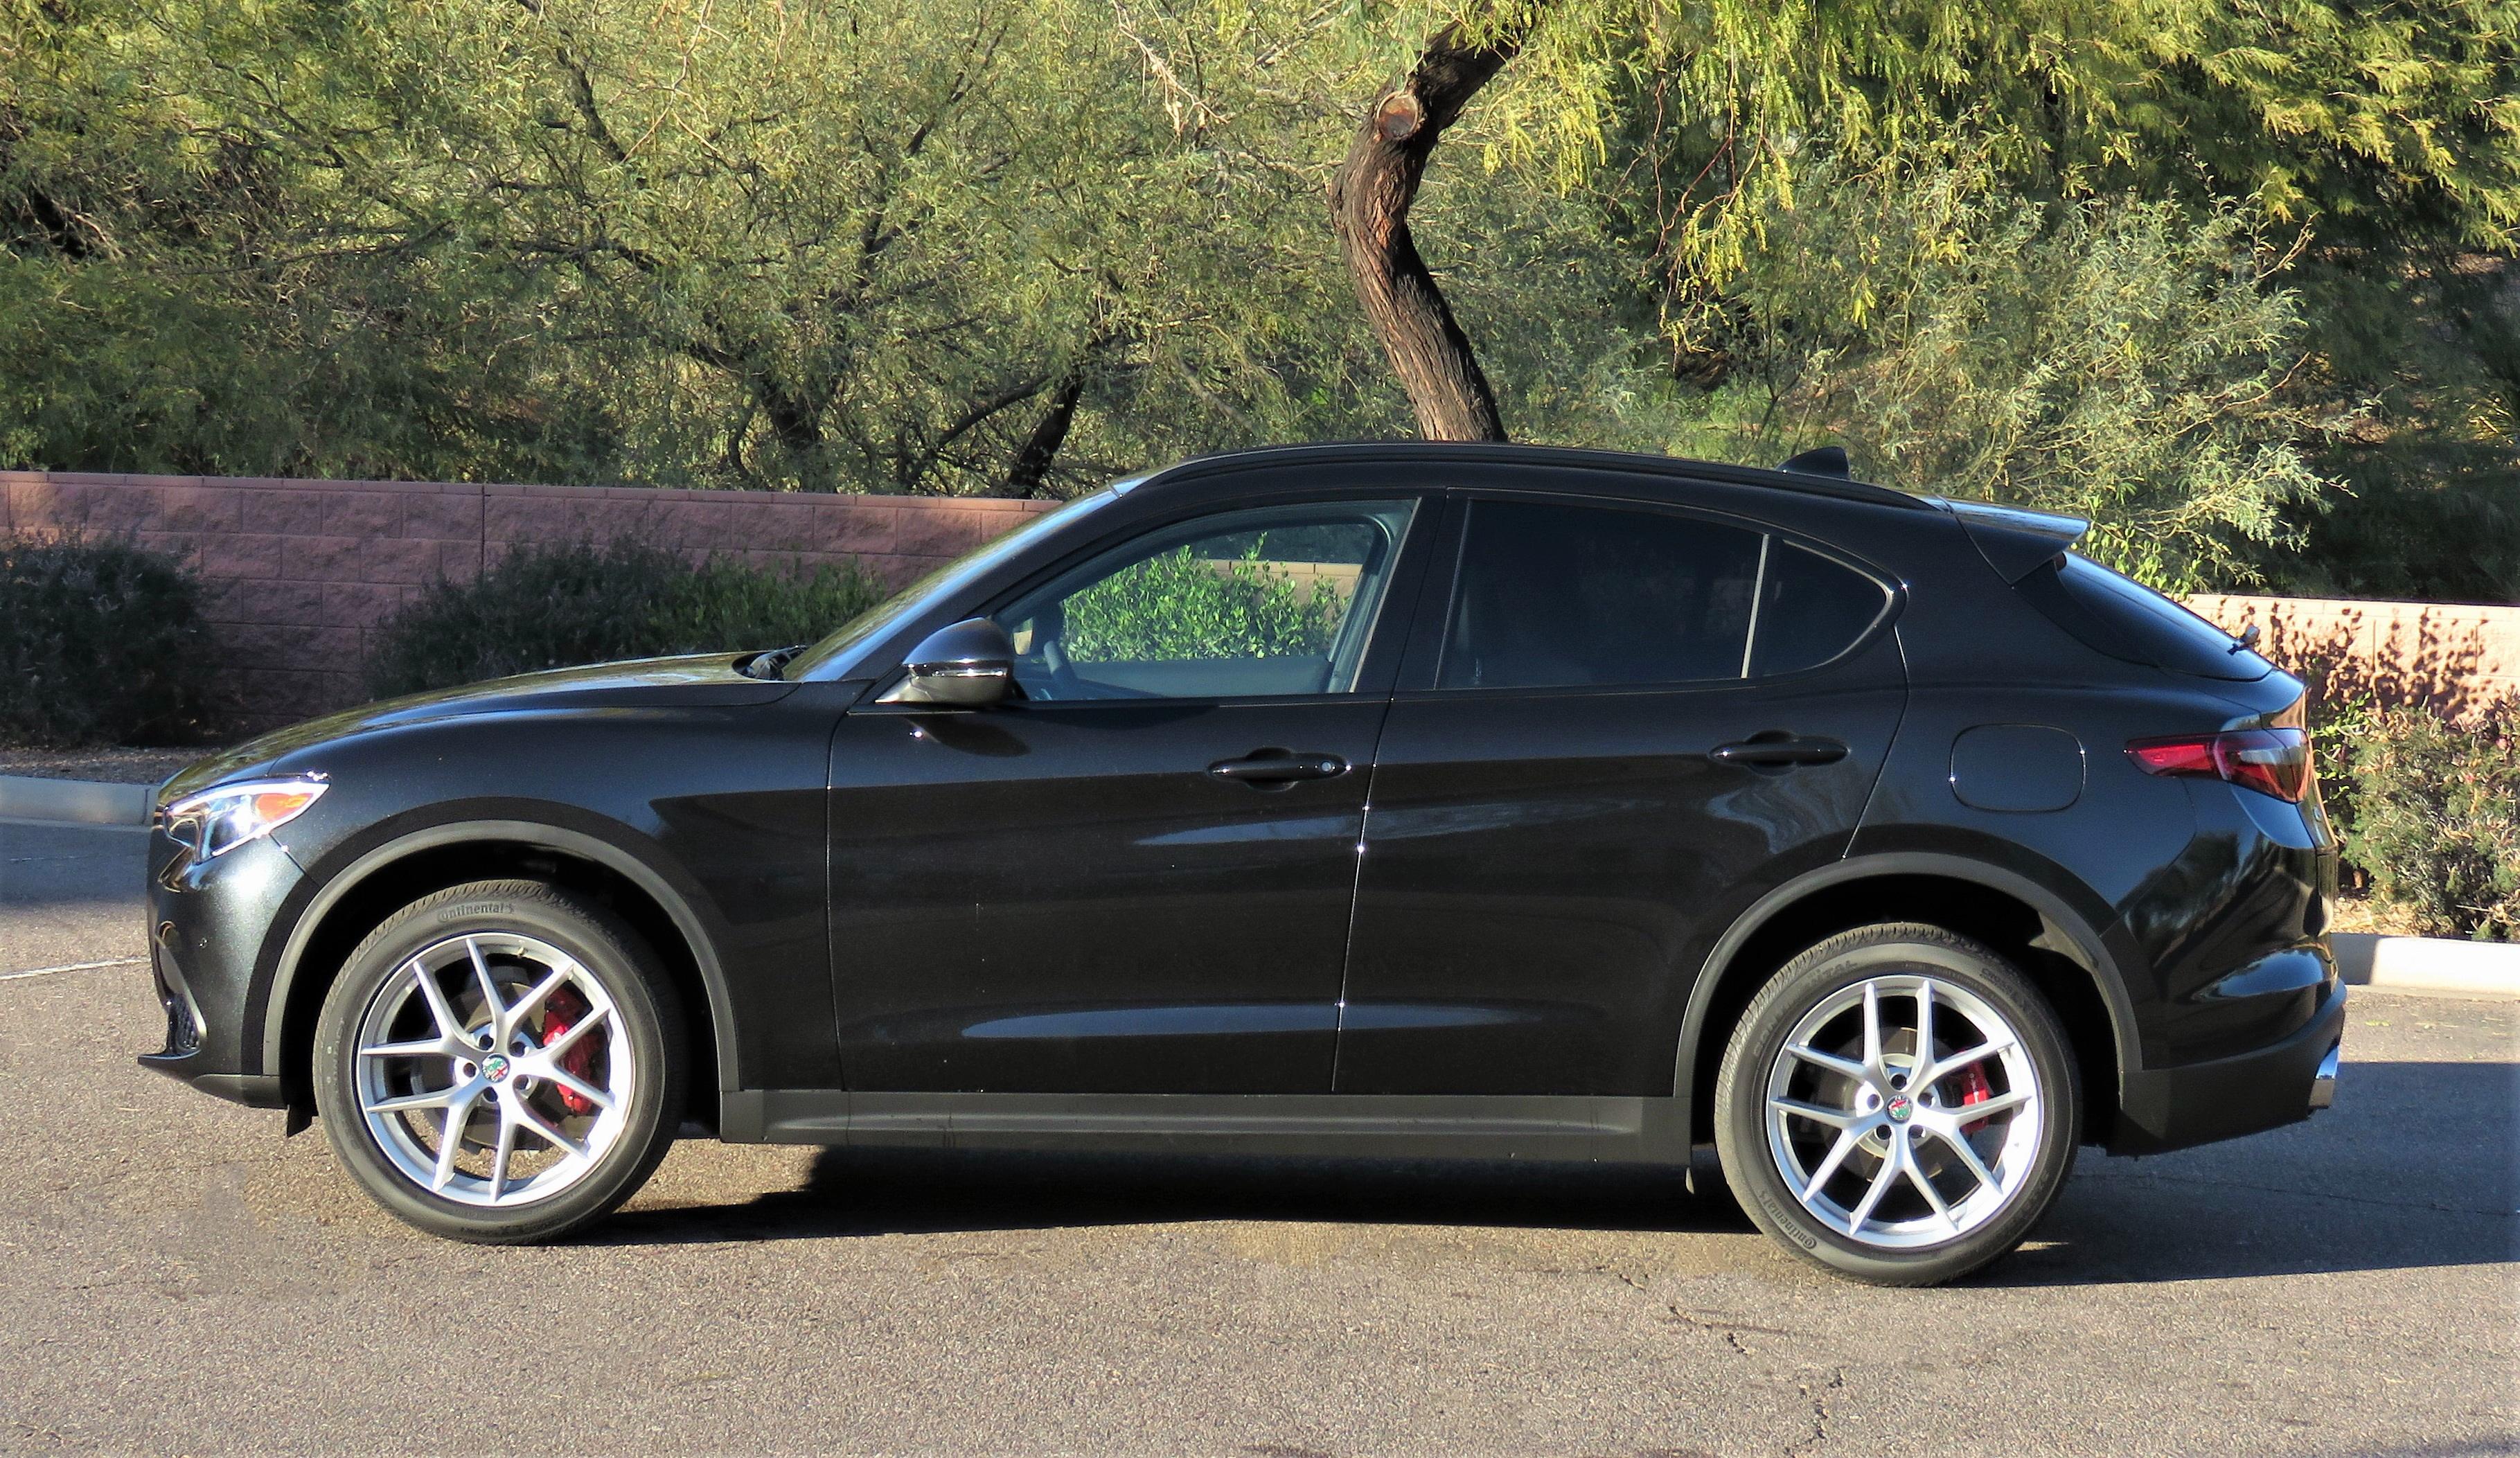 alfa romeo, All-new 2018 Alfa Romeo Stelvio SUV, ClassicCars.com Journal